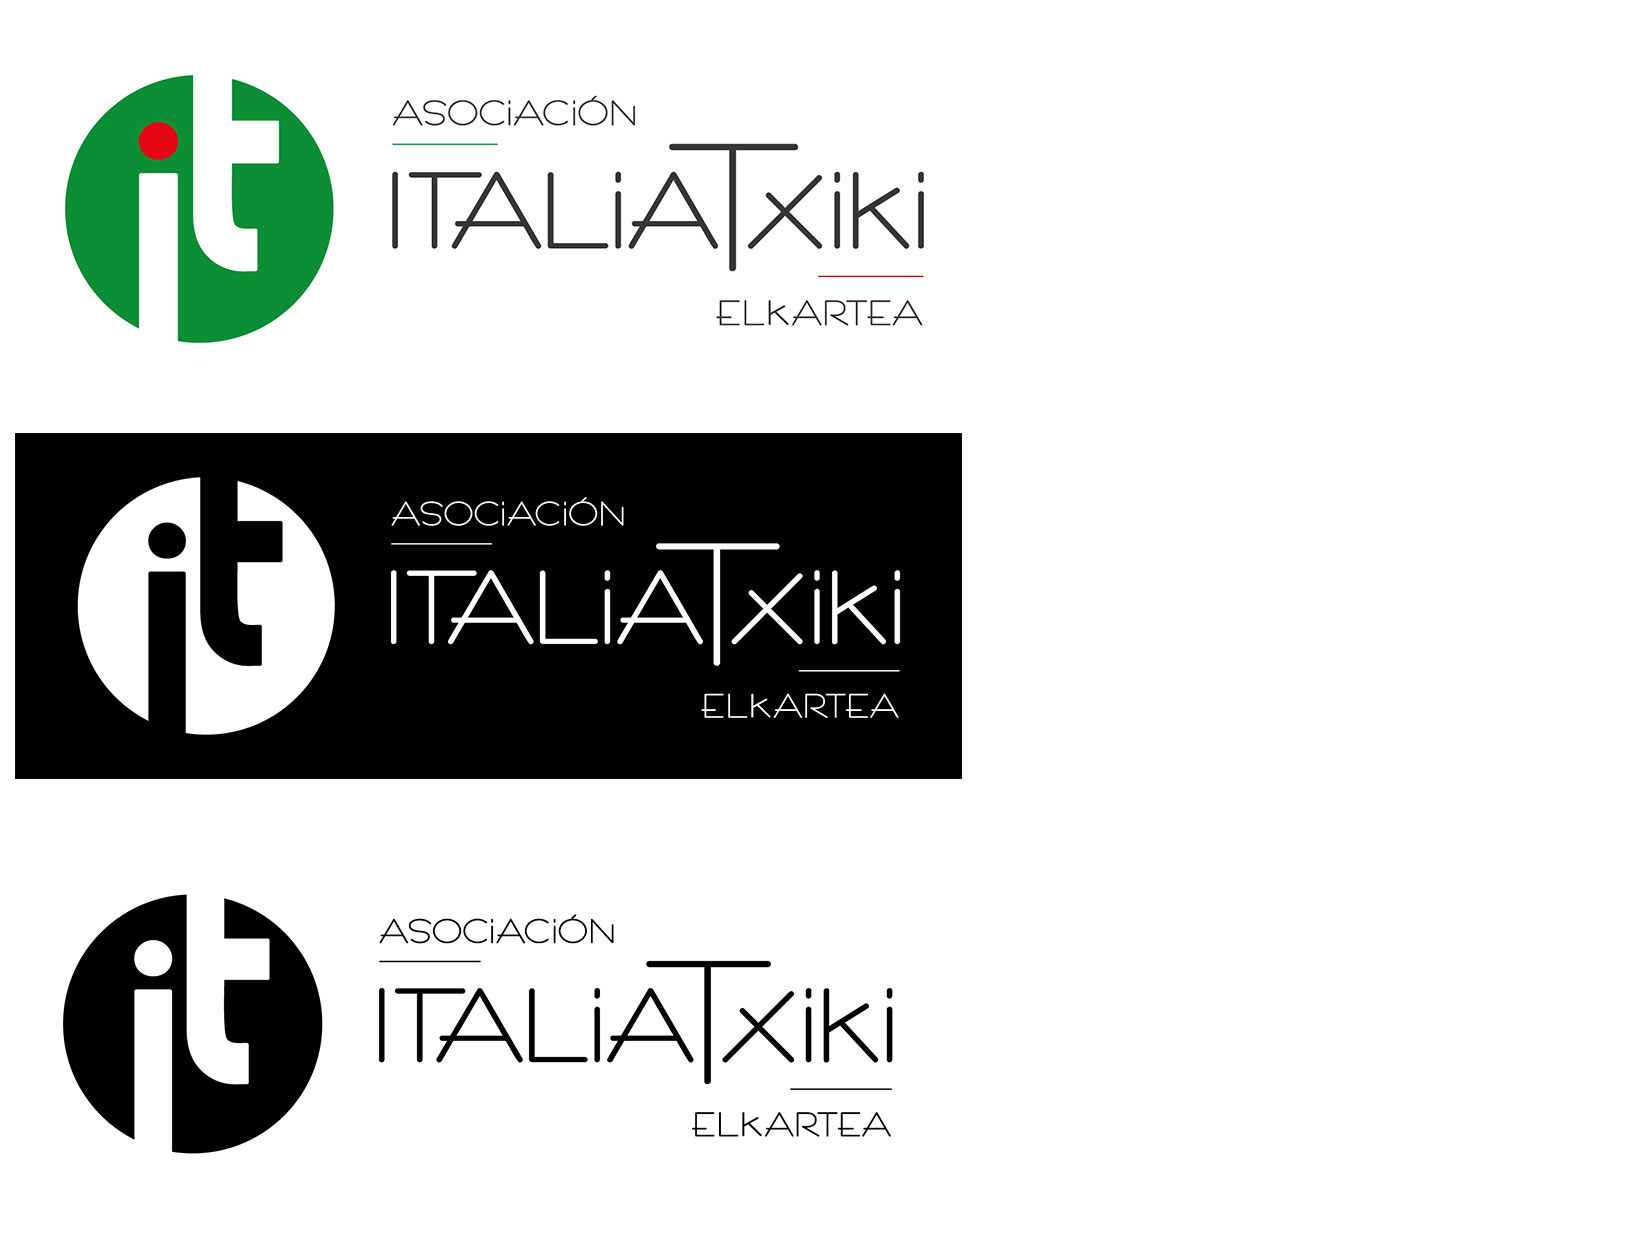 Diseño Logo: creación logotipo para la Asociación ItaliaTxiki Elkartea.